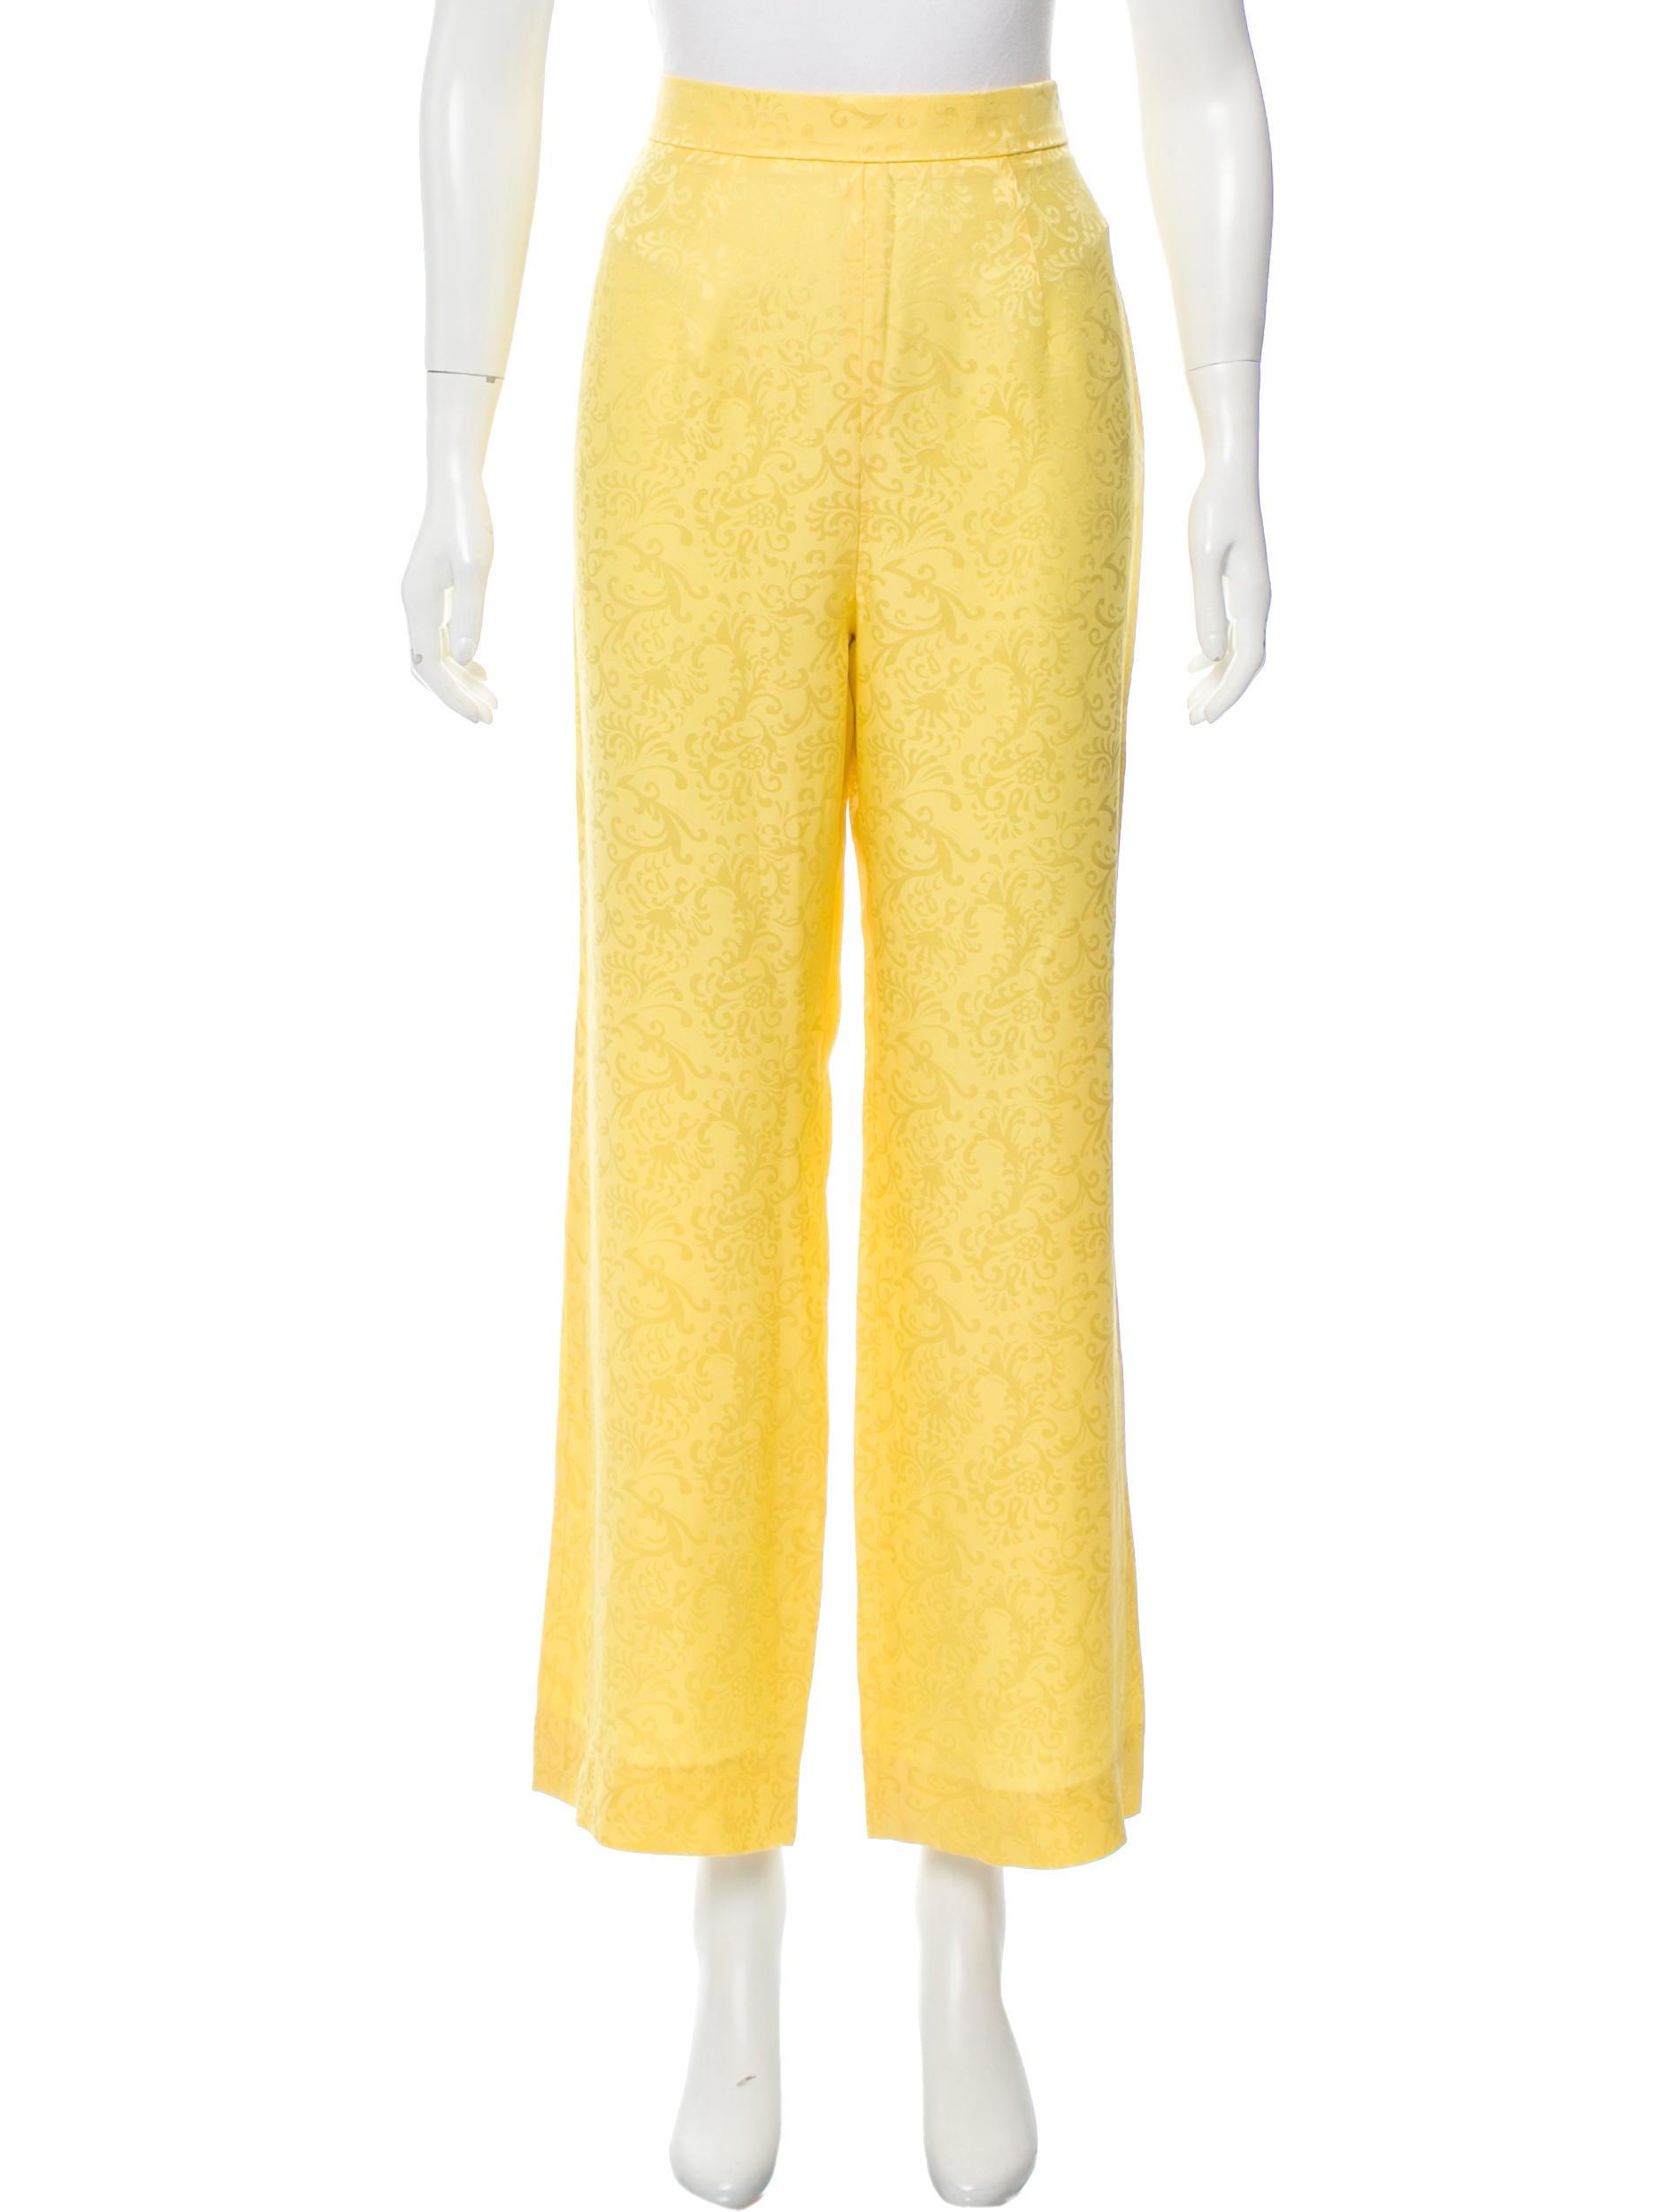 Oscar de la renta patterned silk pants clothing for Oscar de la renta candles